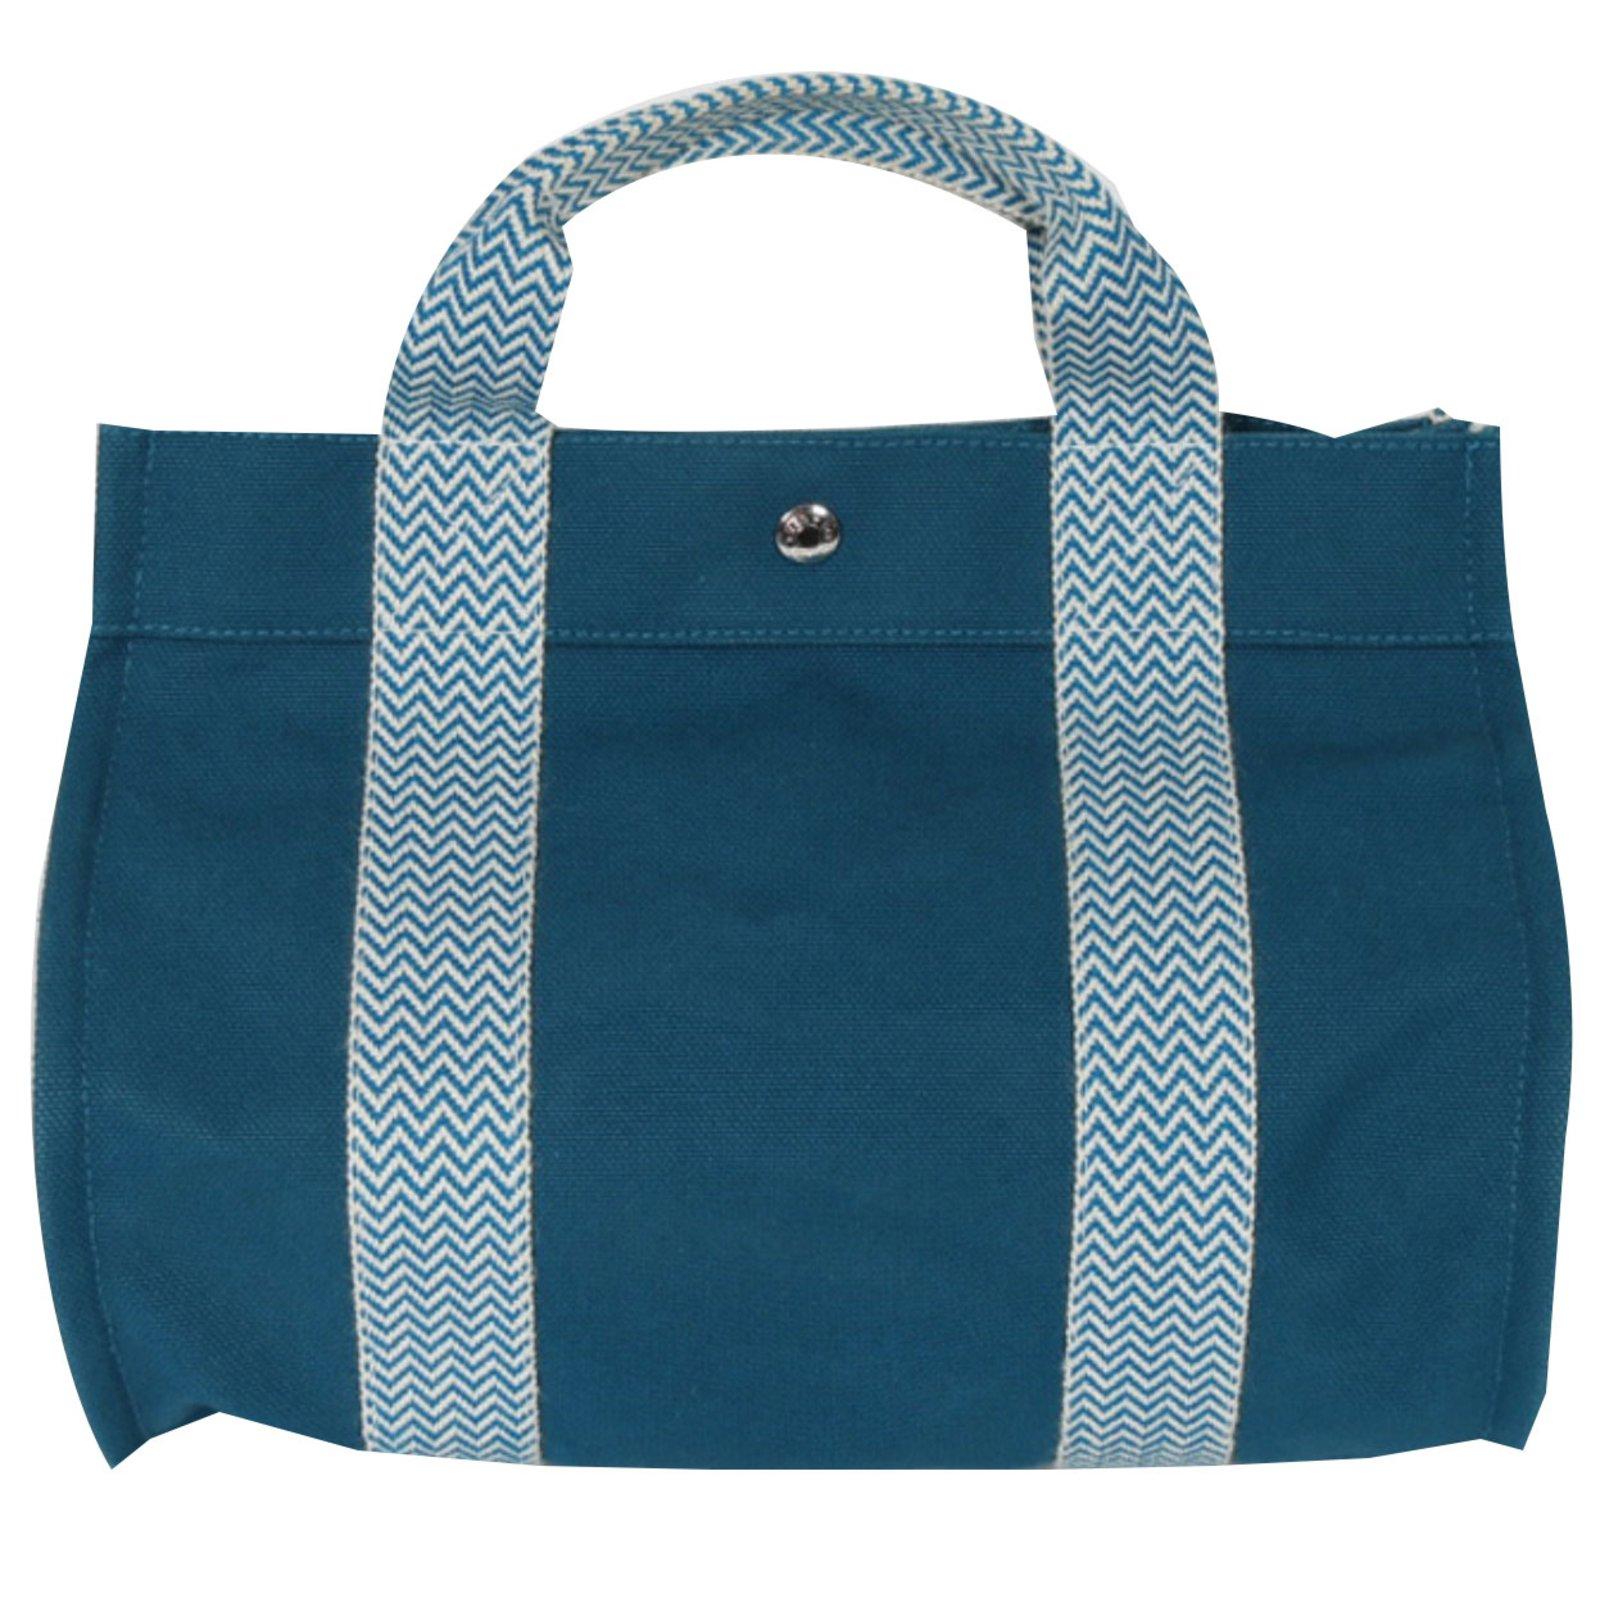 Hermès Hermes Cannes Pm Totebag Totes Cotton Blue Ref 39620